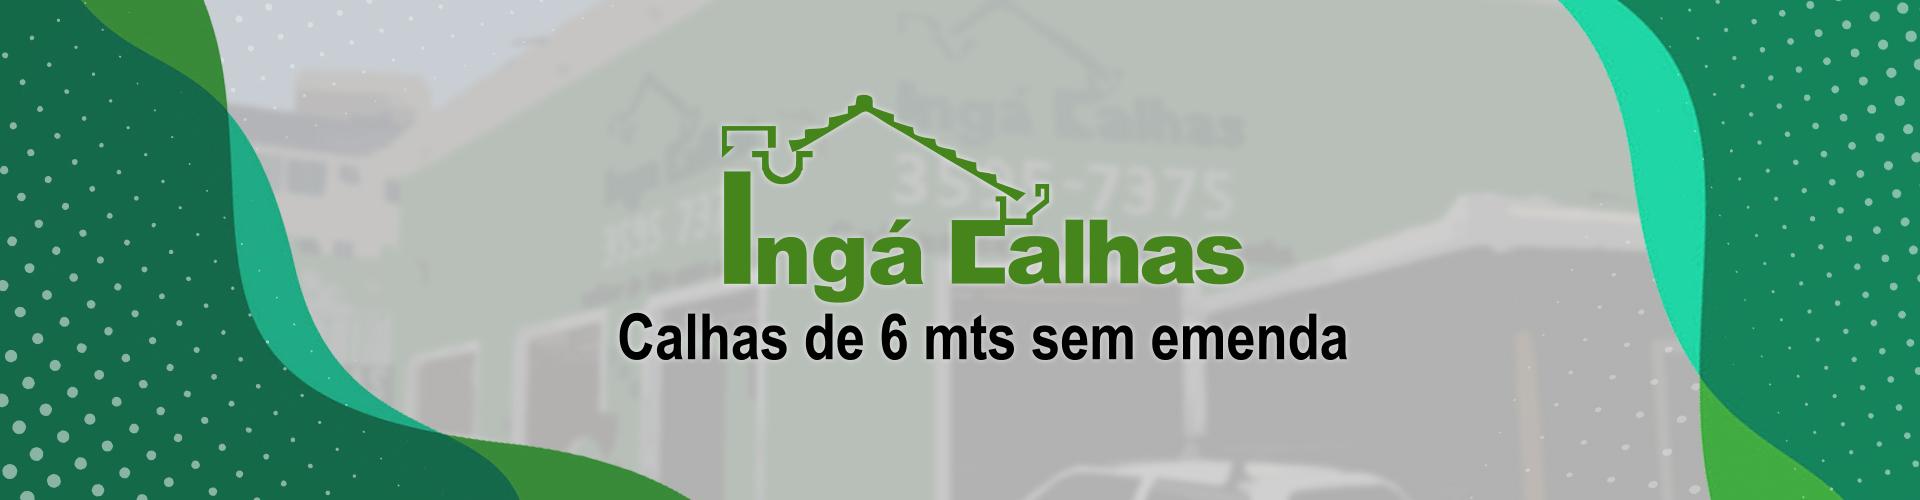 banner-inga-calha1